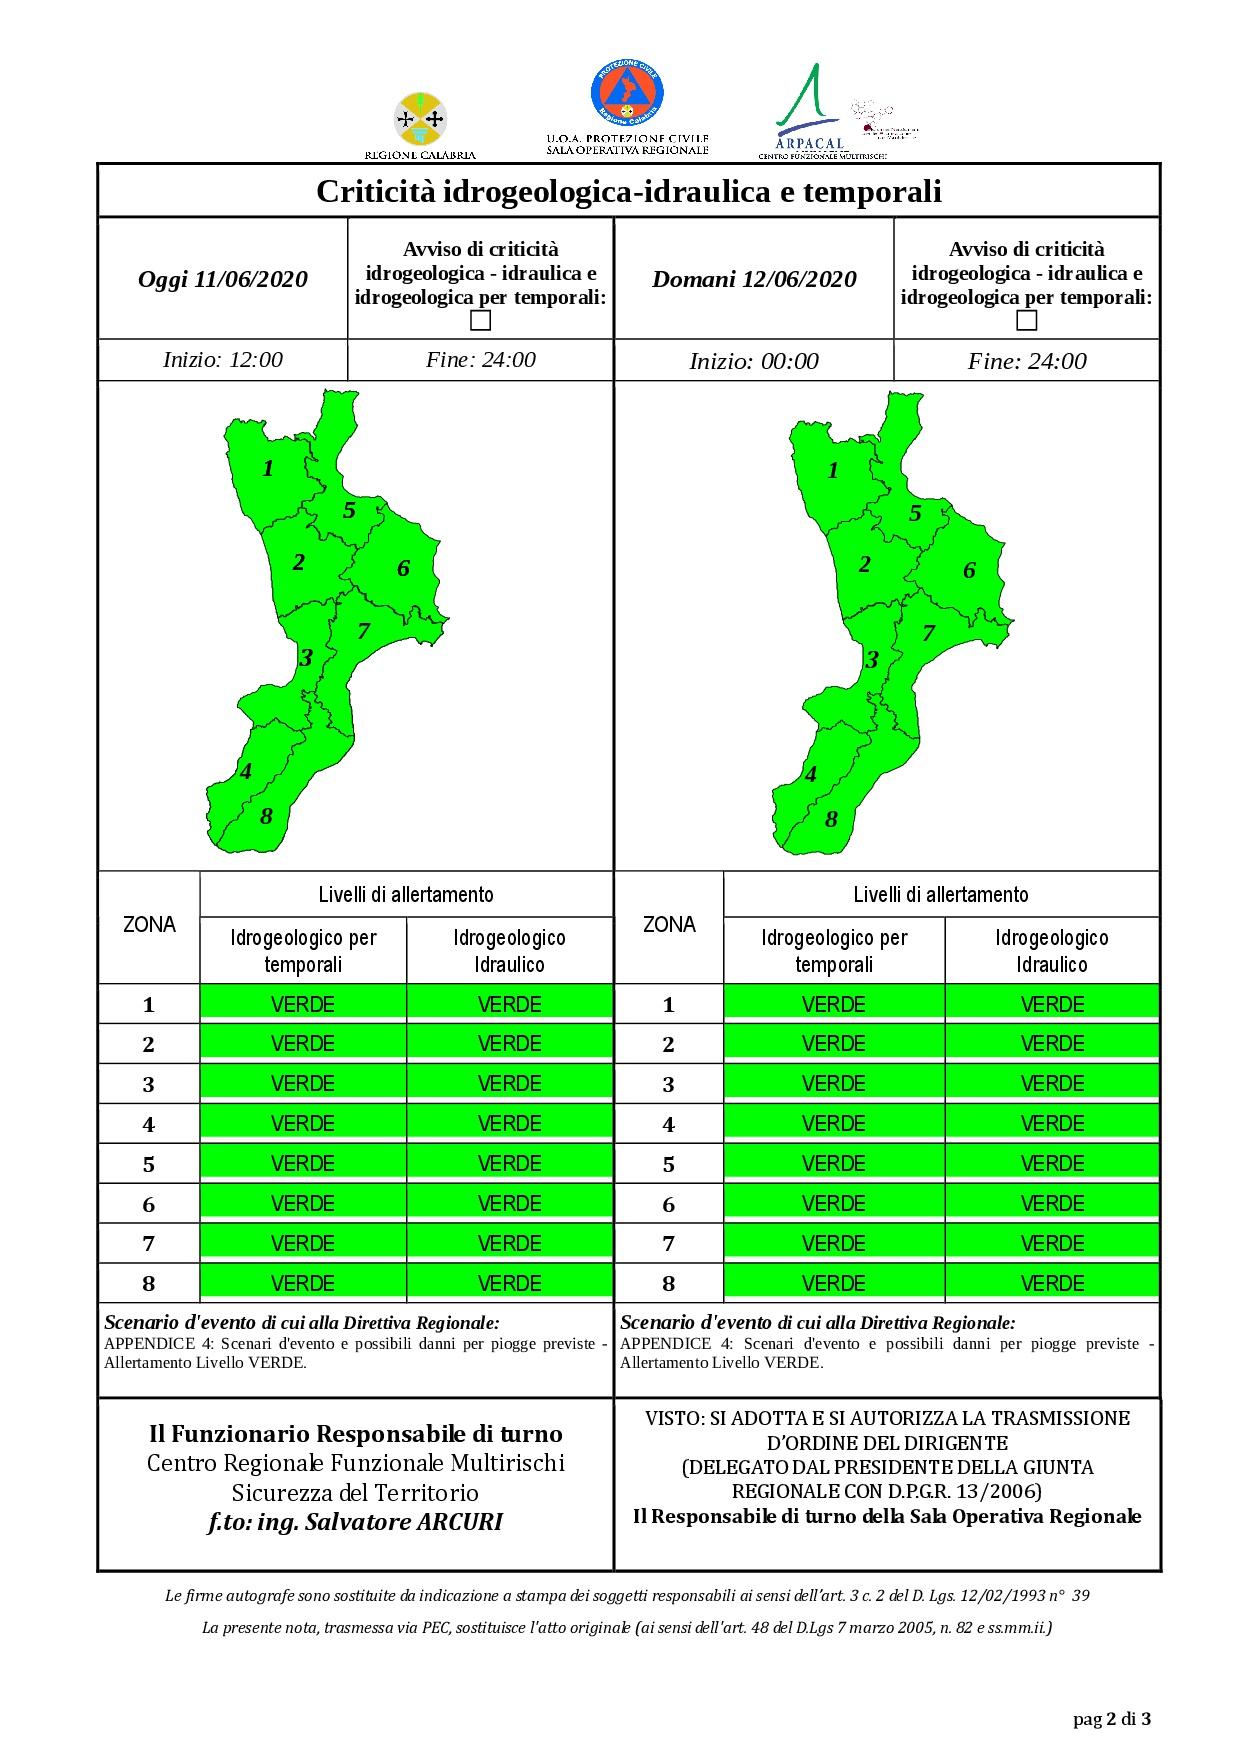 Criticità idrogeologica-idraulica e temporali in Calabria 11-06-2020